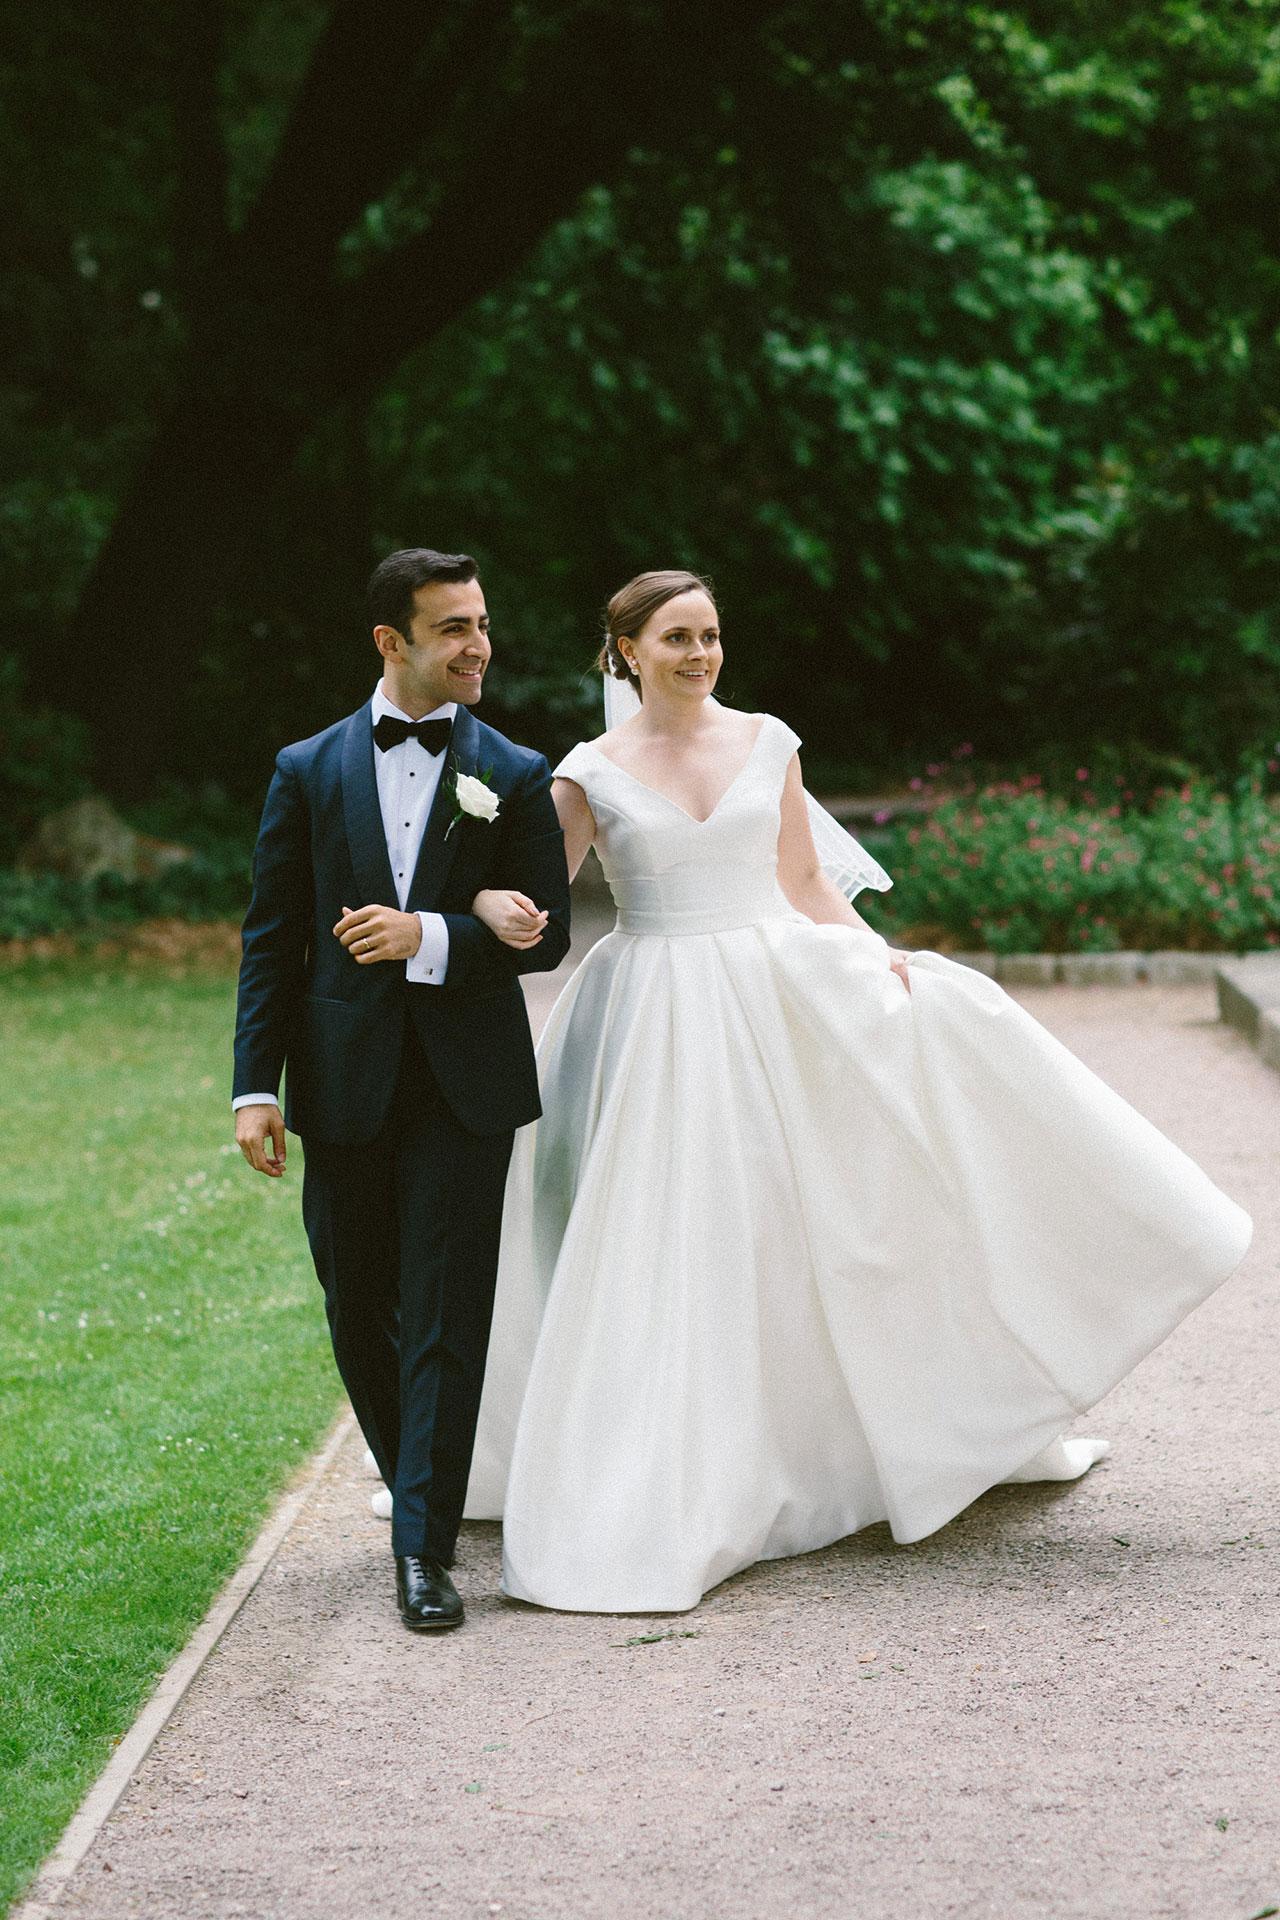 Syon-Park-Wedding-Photographer--_-Michael-Newington-Gray-361.jpg